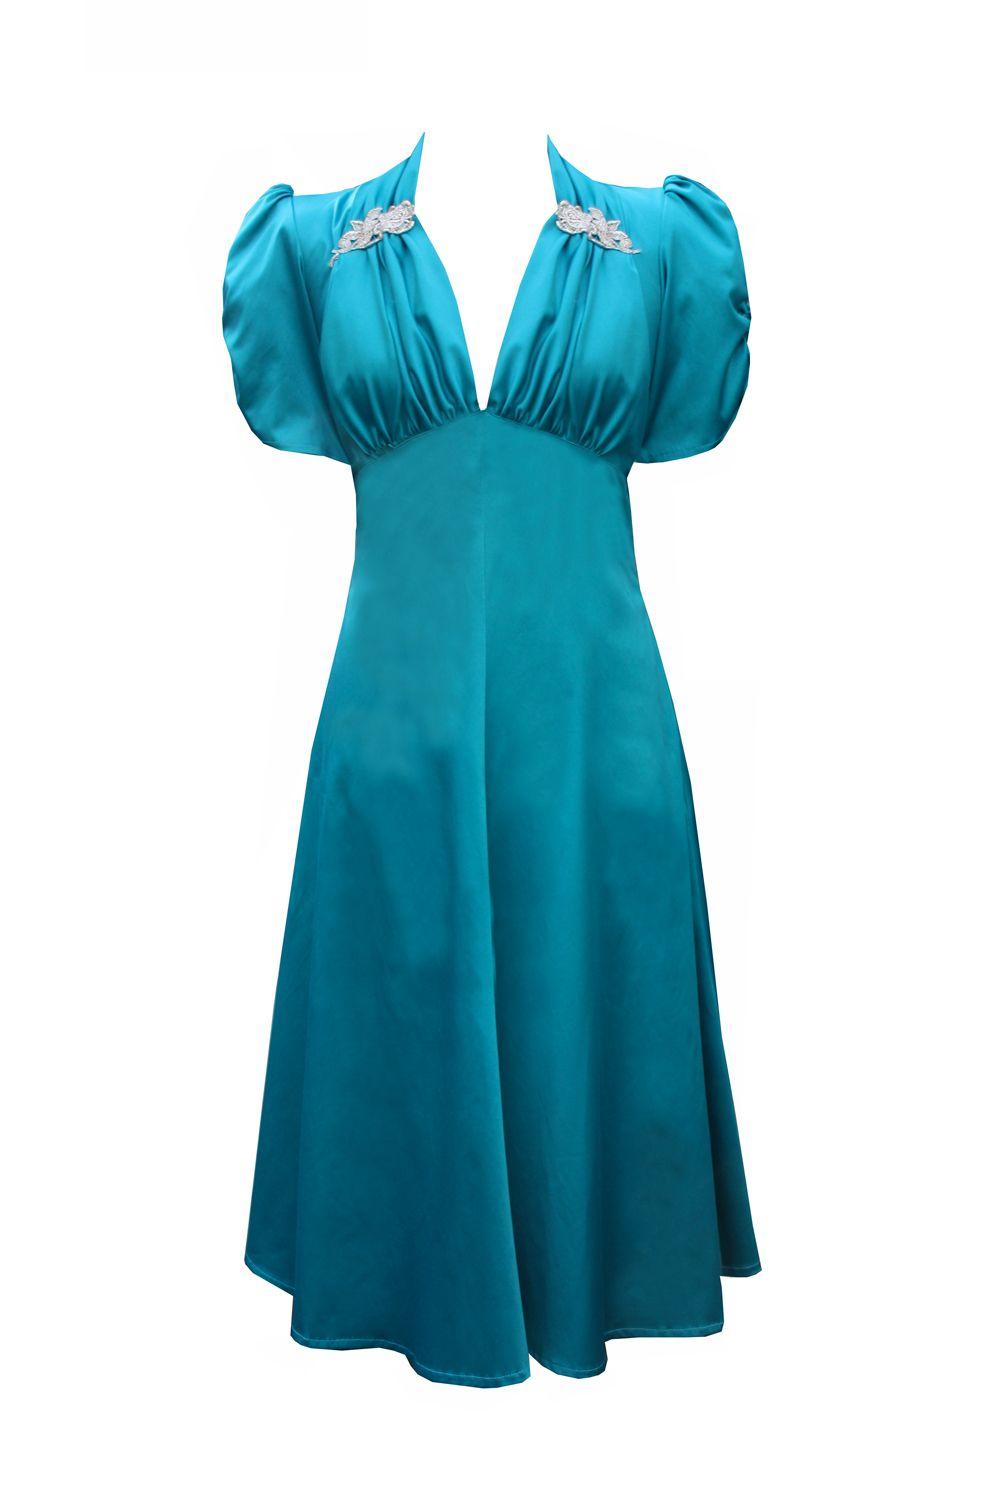 Tara Starlet 1940s 40s Style: Satin Sweetheart Dress